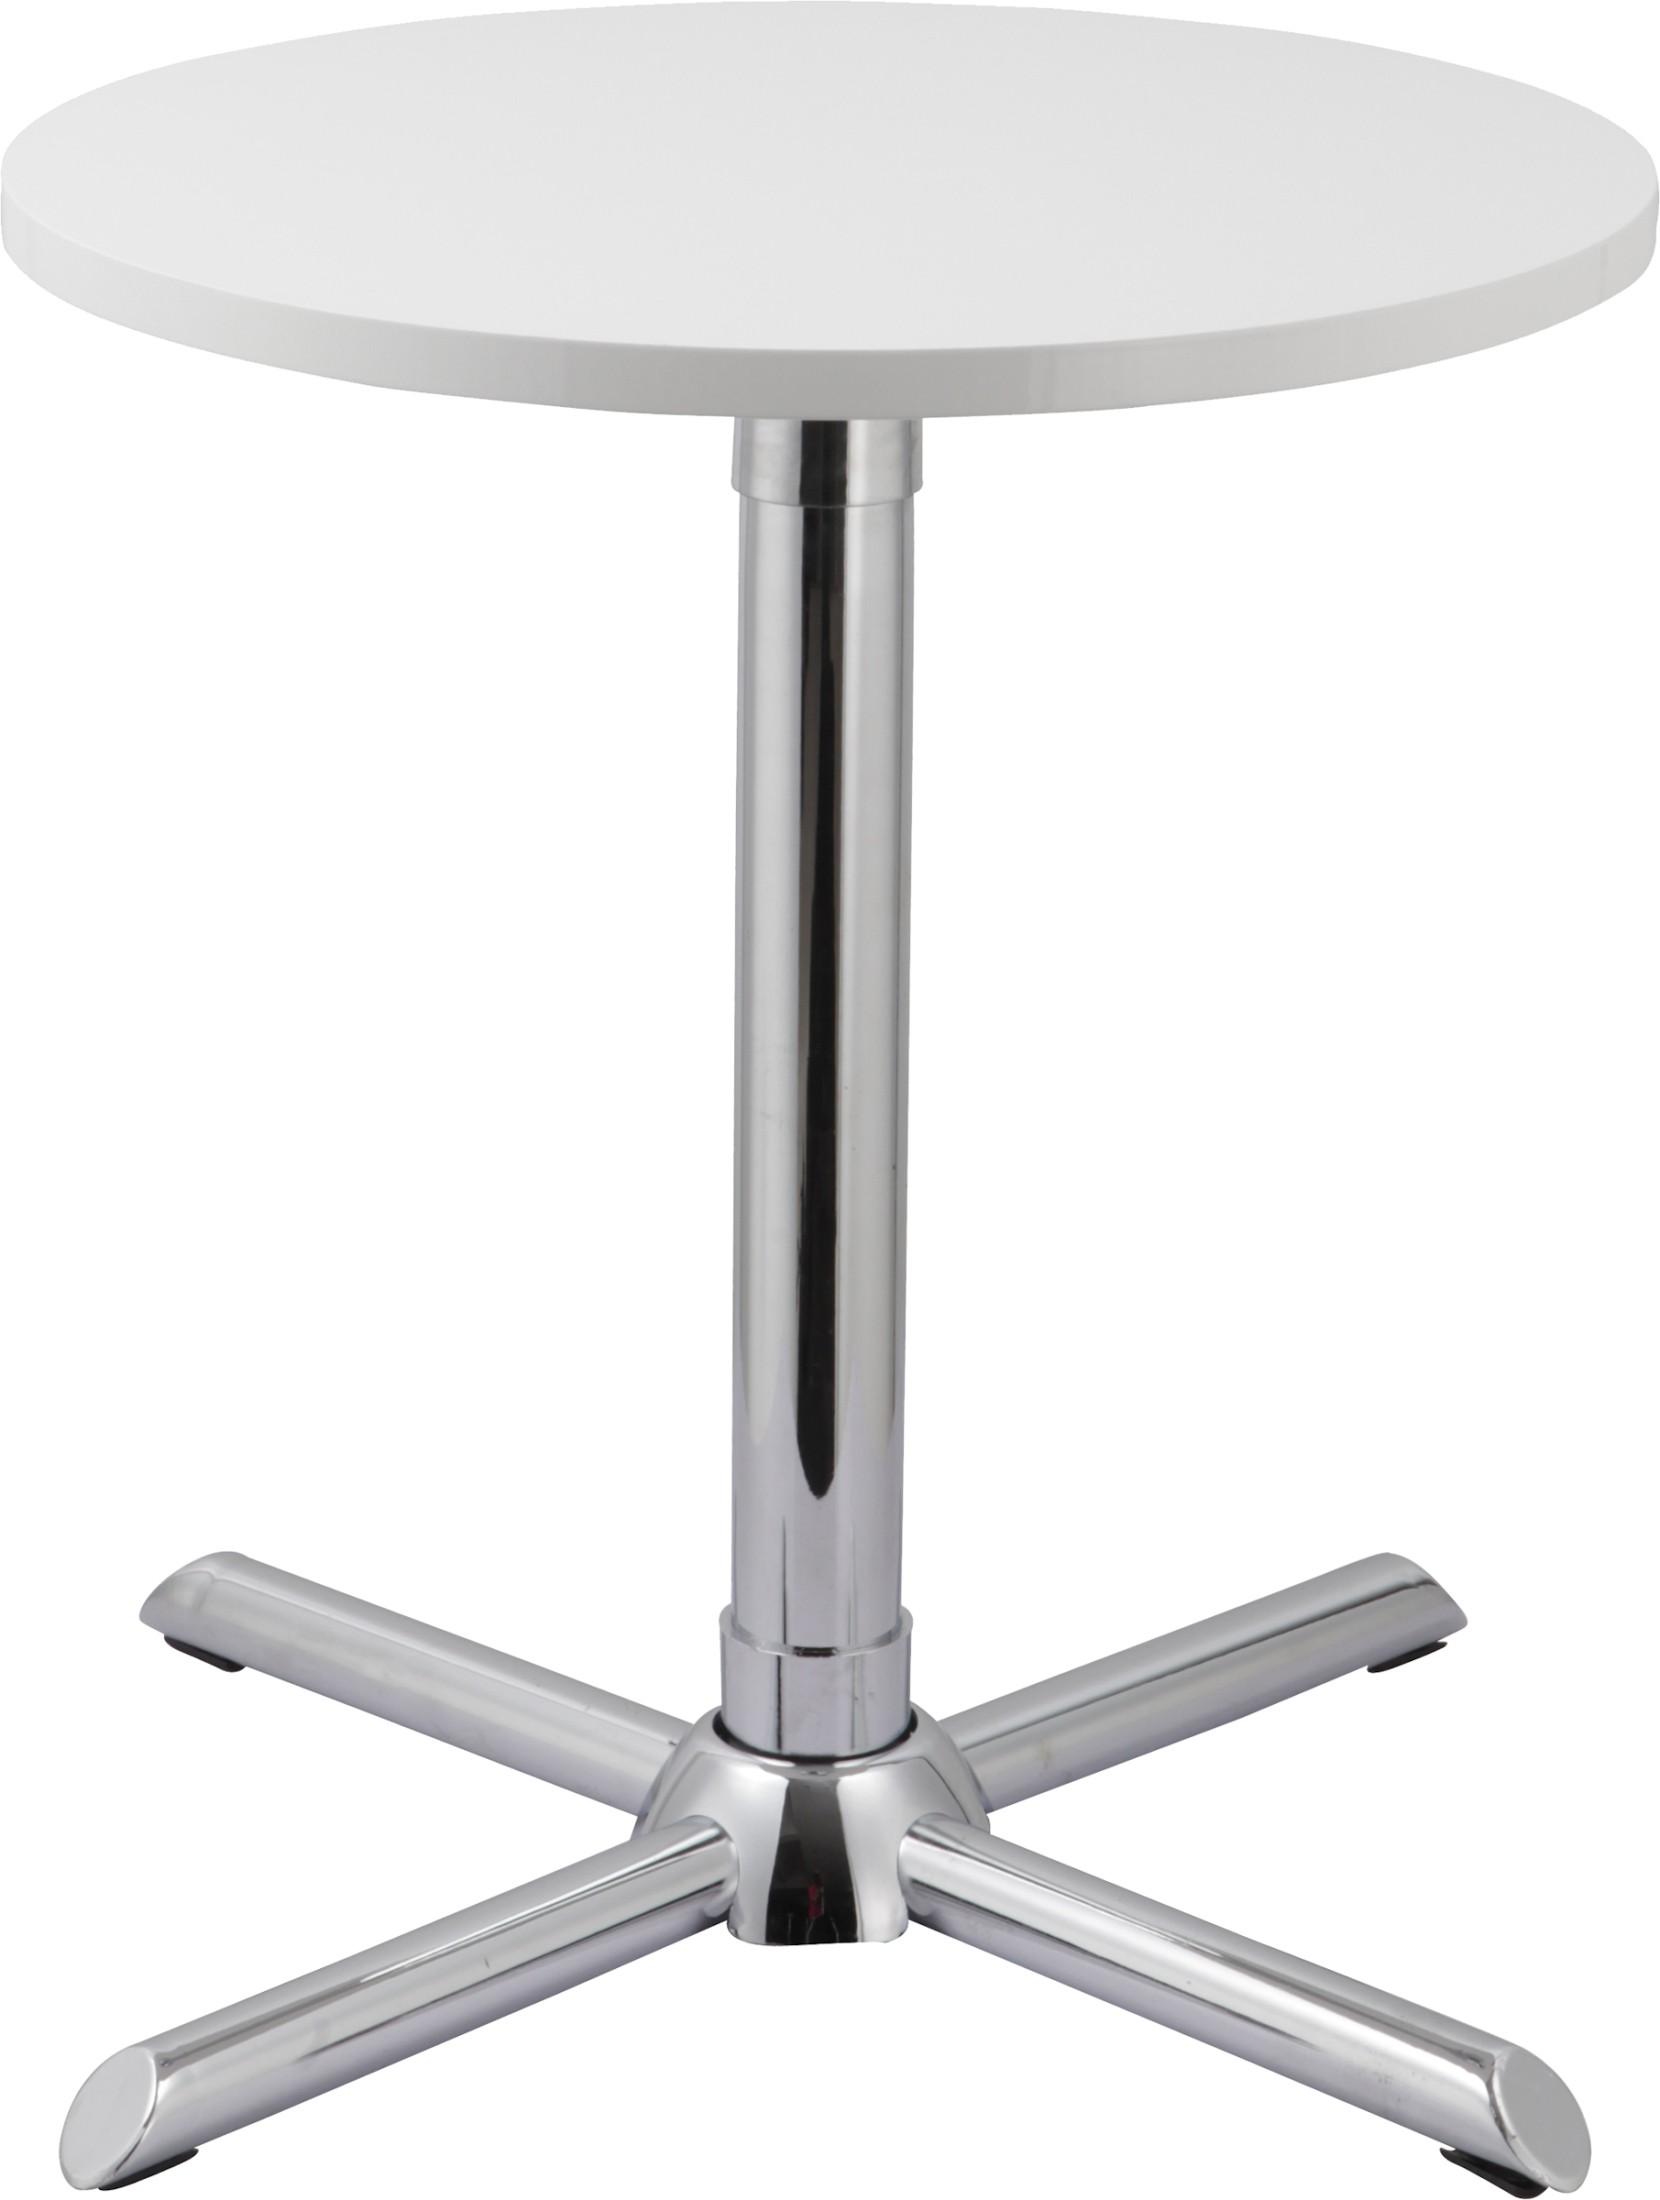 felix white round end table 60326 sunpan modern home. Black Bedroom Furniture Sets. Home Design Ideas